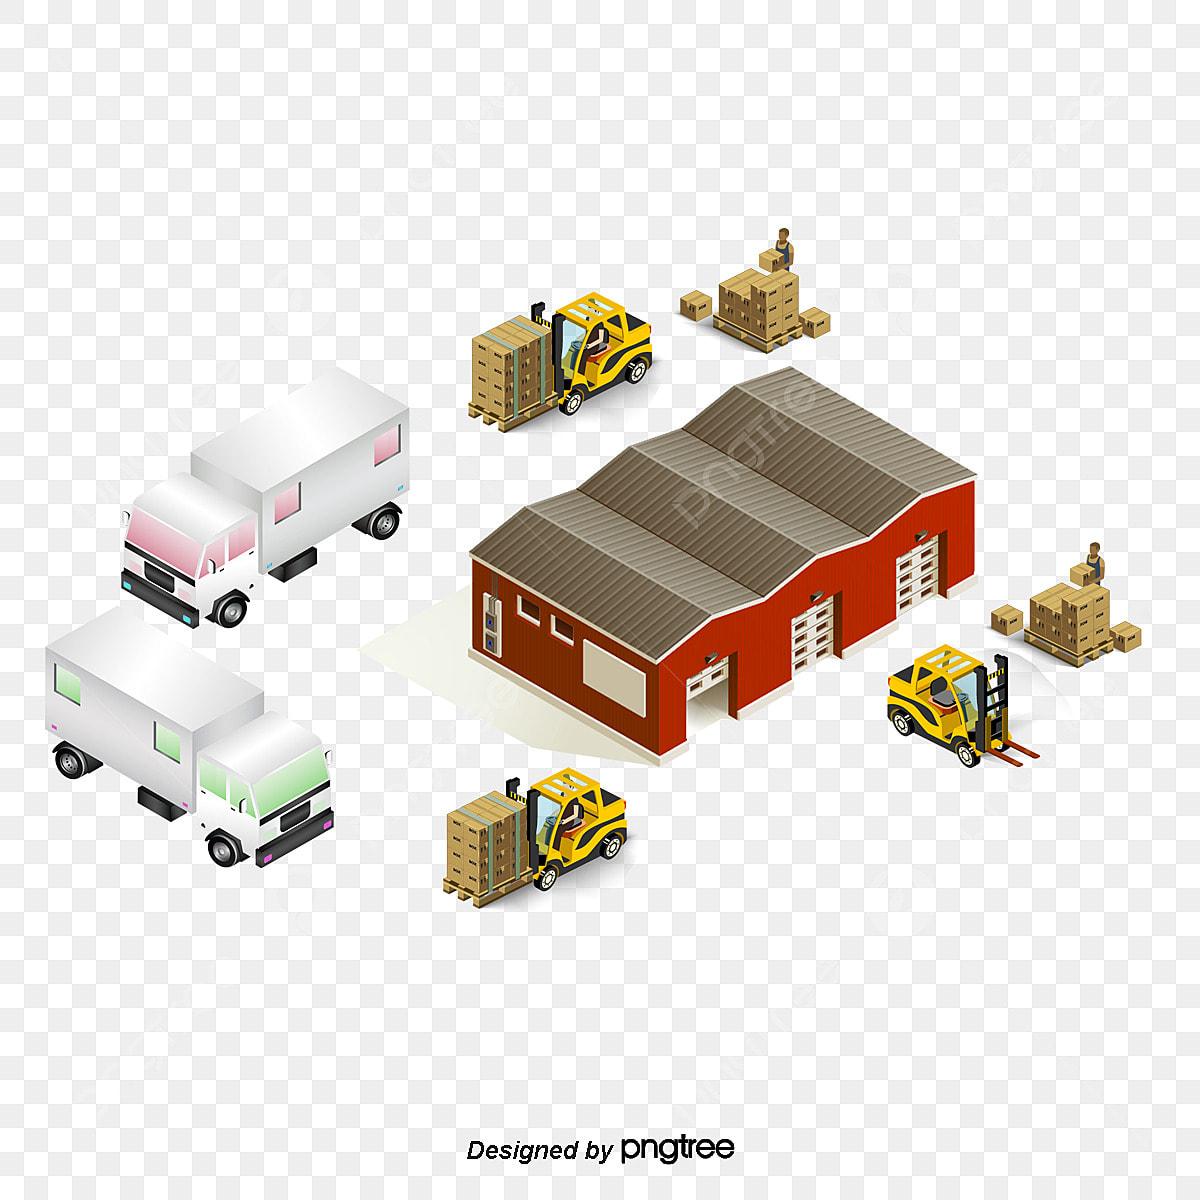 Building design for storage warehouse - Download Free Vectors, Clipart  Graphics & Vector Art